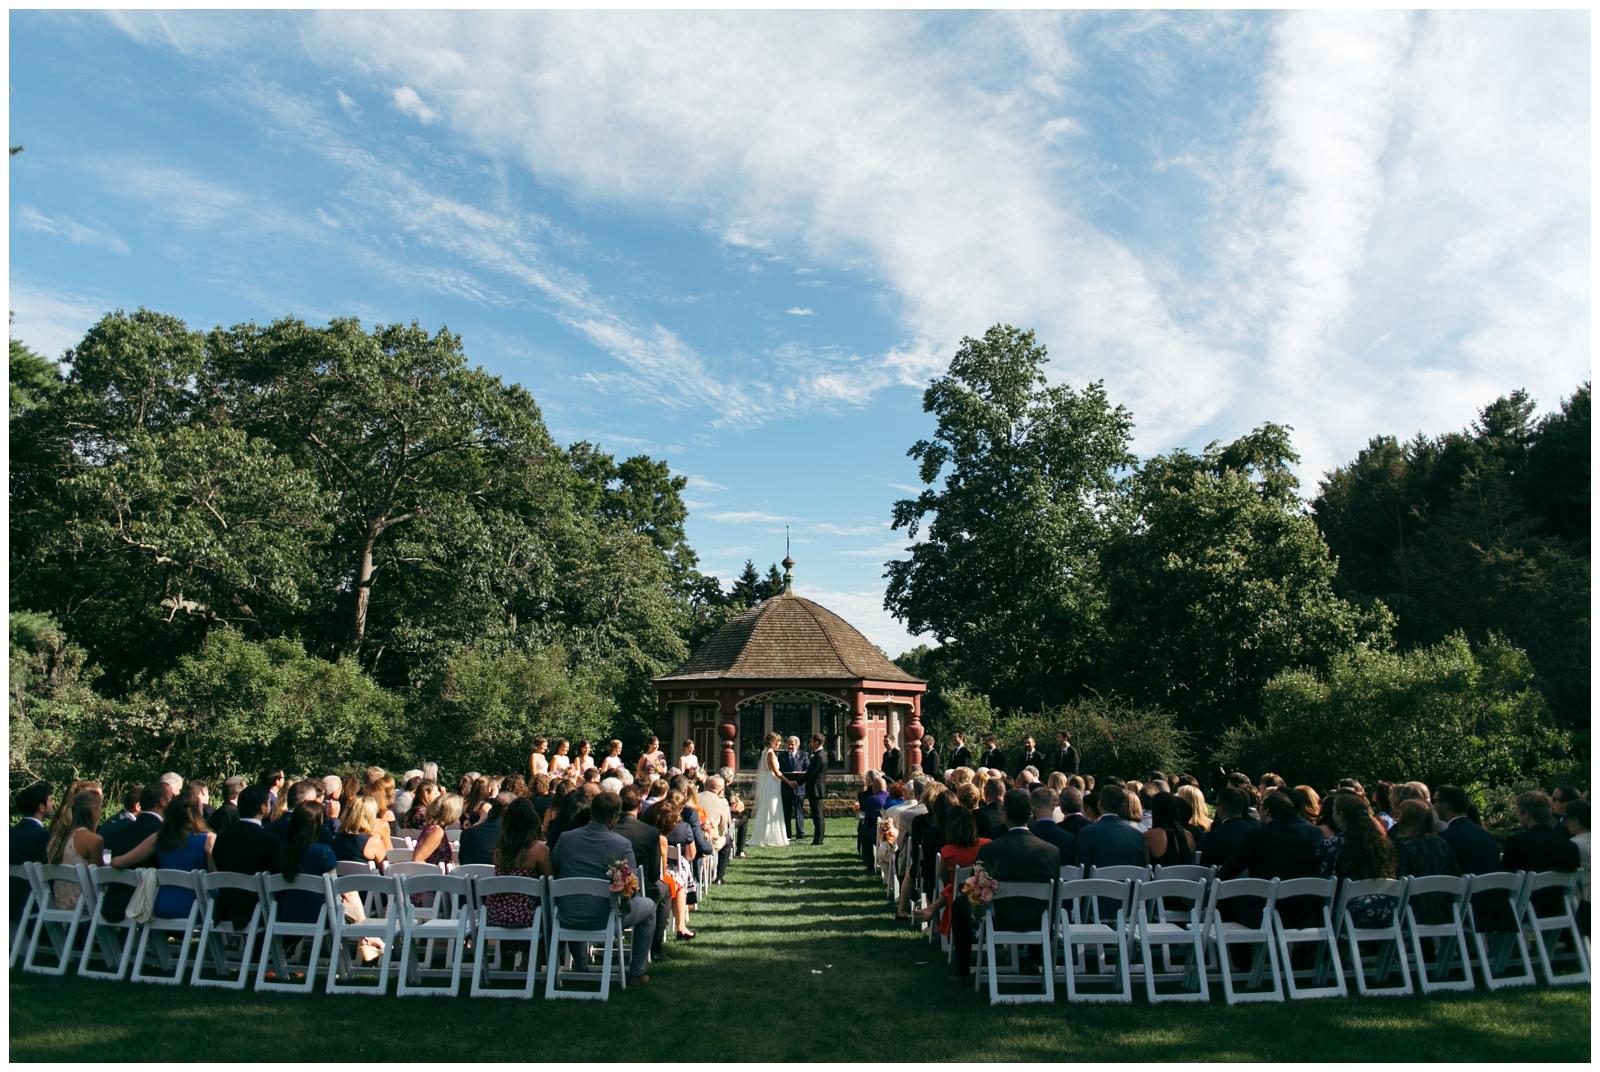 Moraine-Farm-wedding-Bailey-Q-Photo-Massachusetts-wedding-photpgrapher-064.jpg